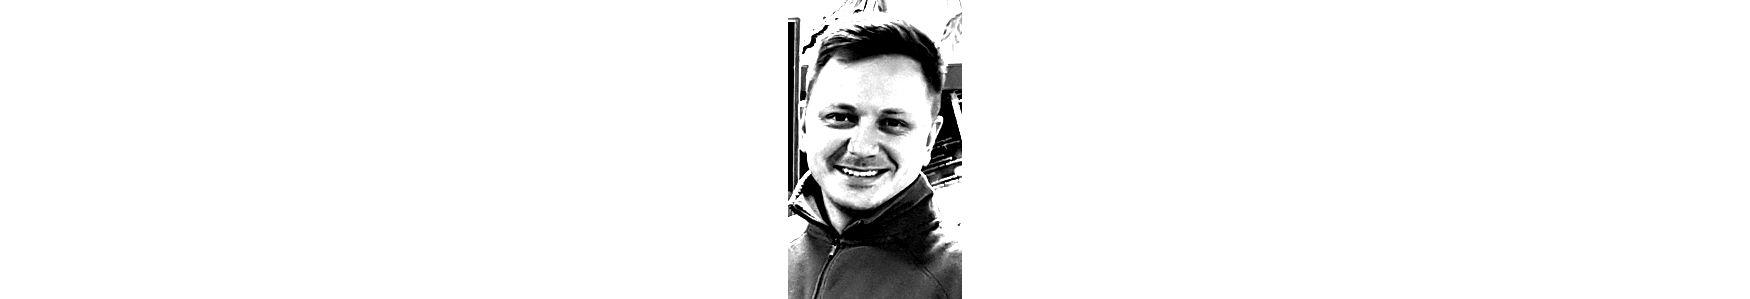 Ben Ward - General Manager